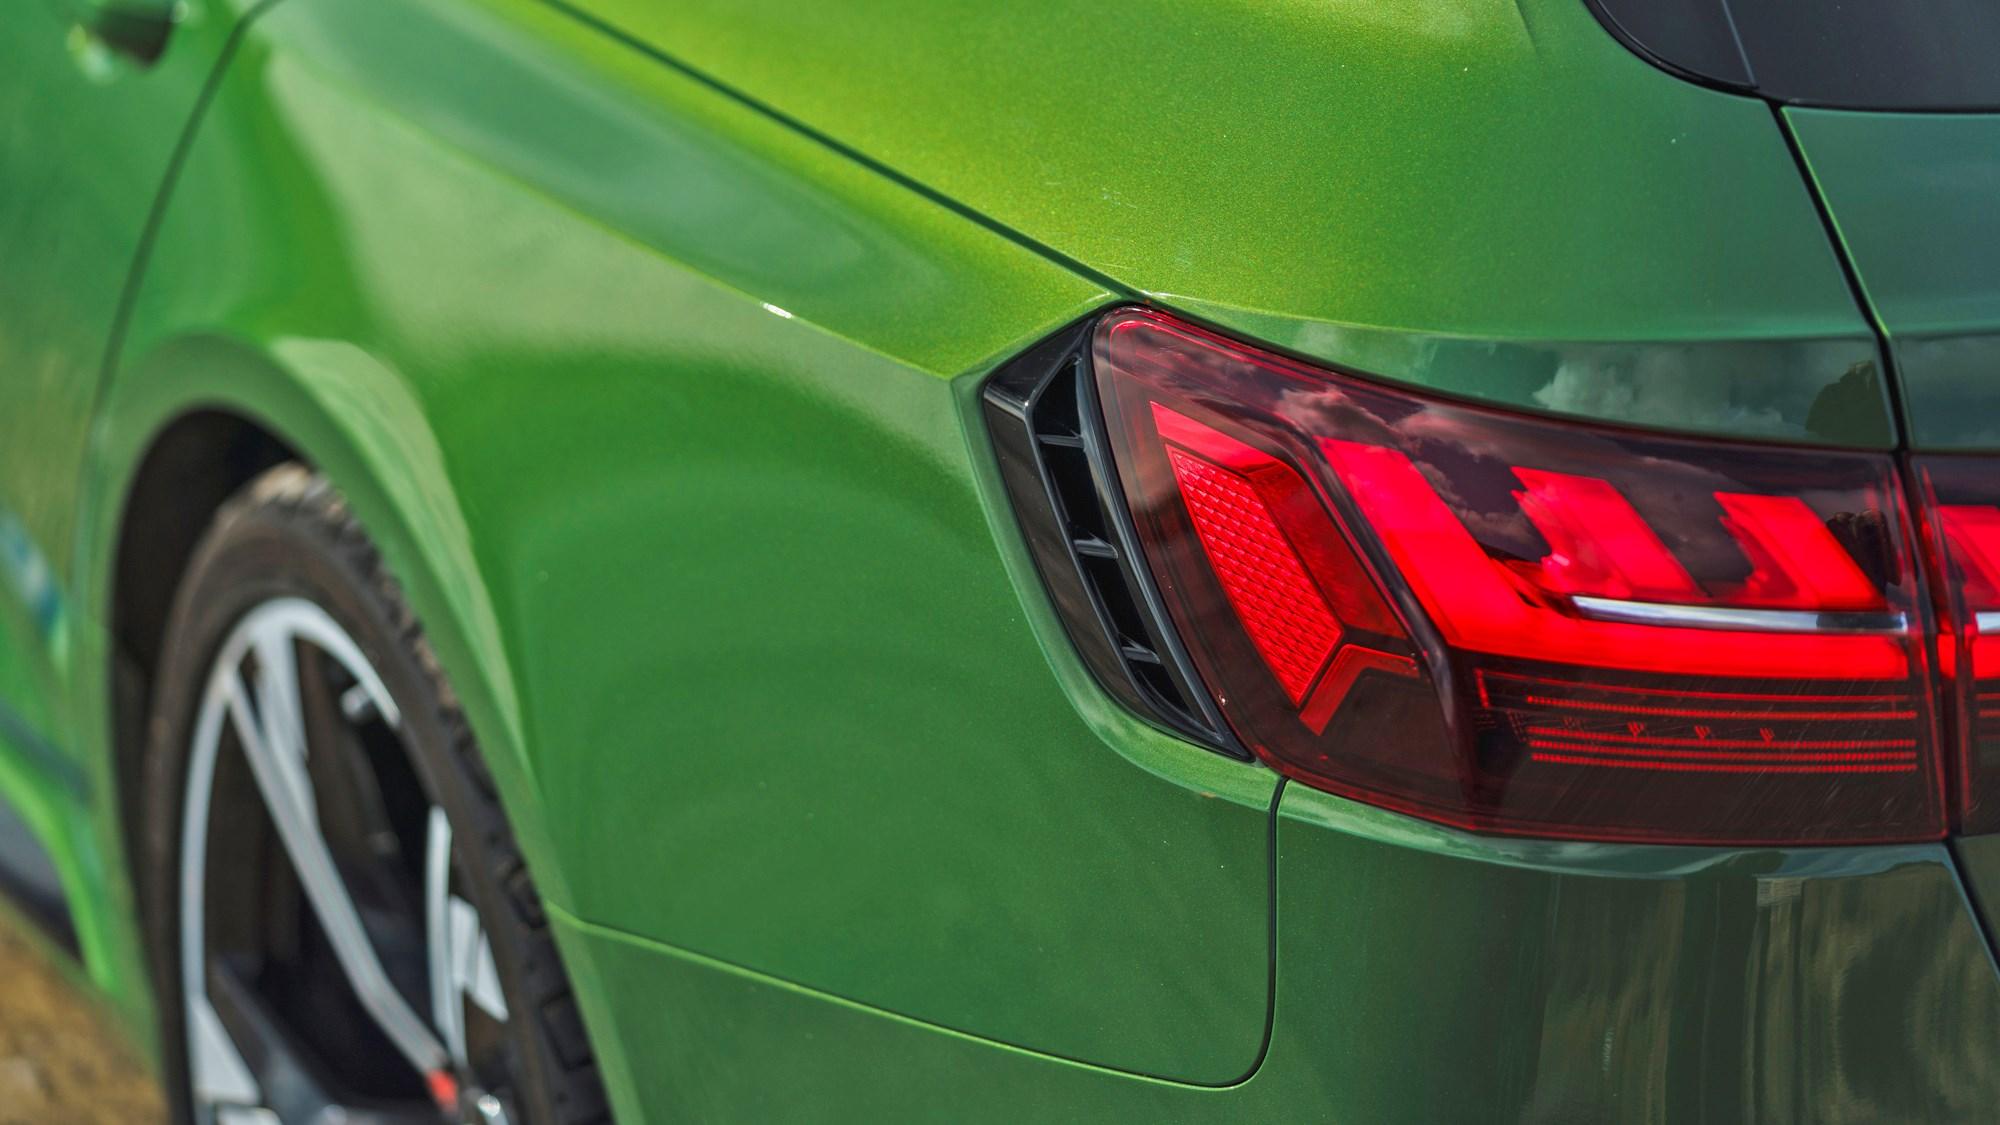 Green 2021 Audi RS4 Avant rear wheelarch blisters